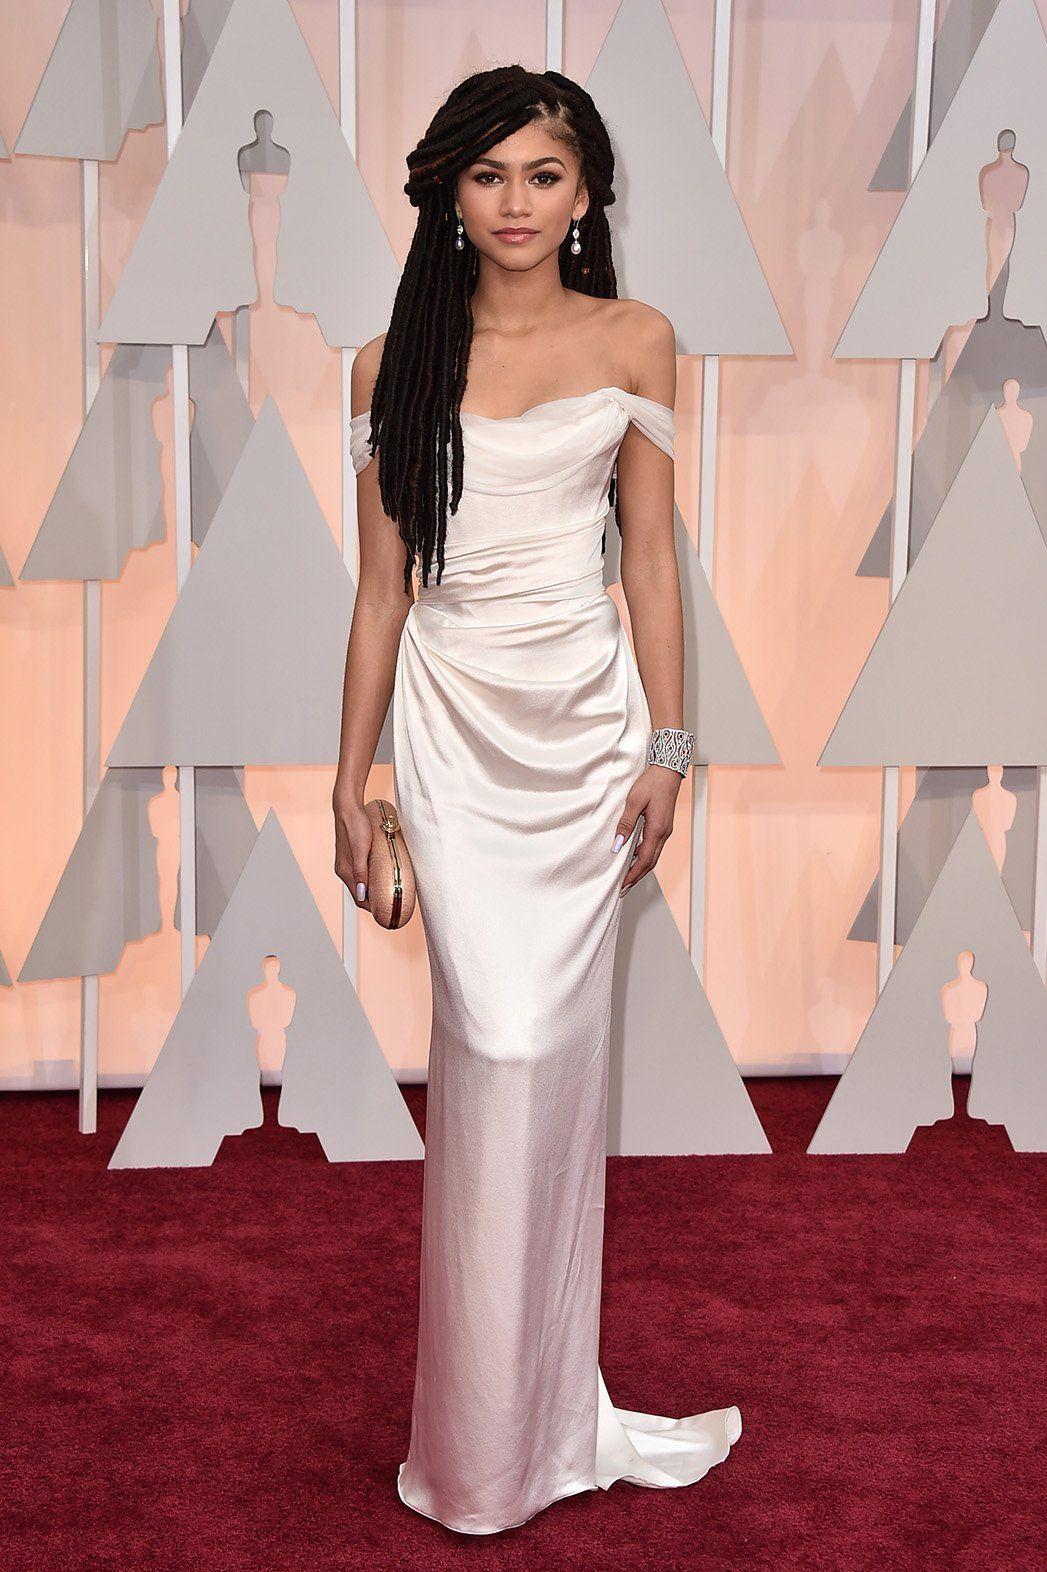 8916ba7f287 Zendaya Celebrity Actress Off The Shoulder White Vivienne Westwood Gown  Silk Oscars 2015 Red Carpet